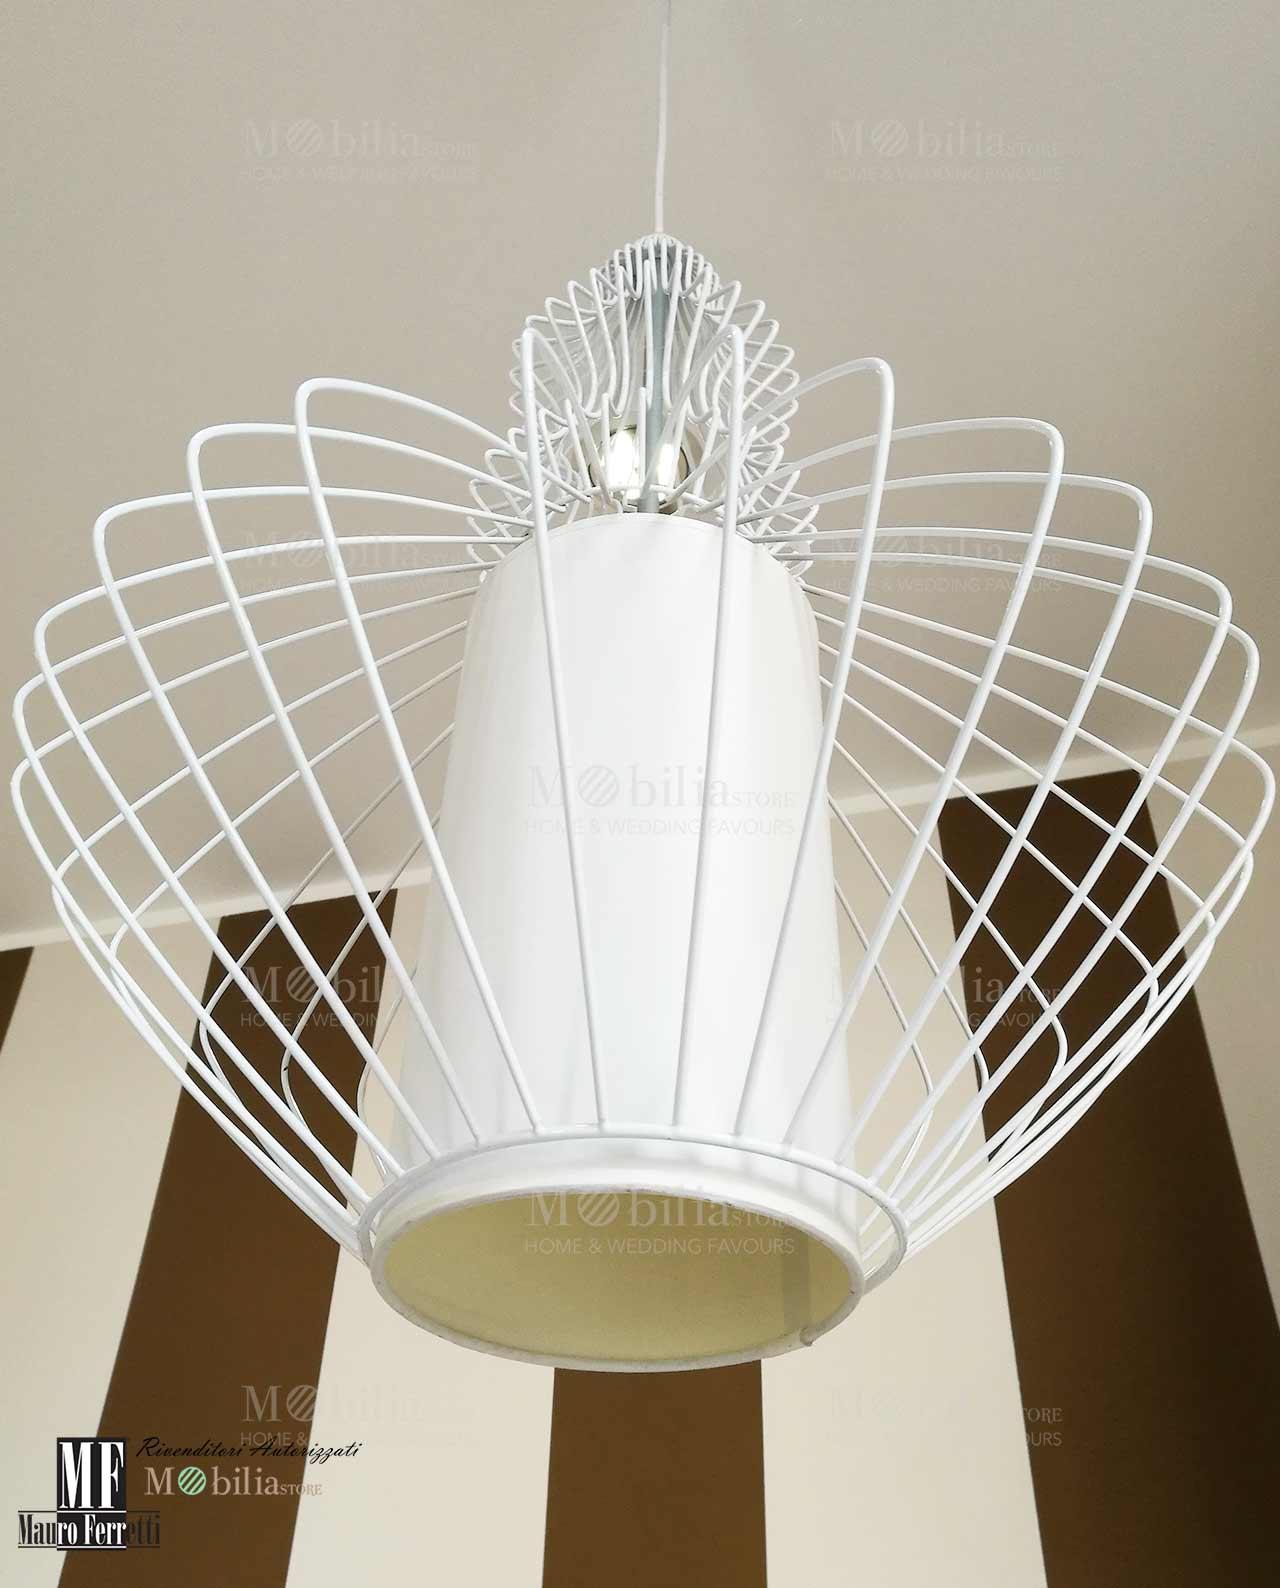 Lampadario soffitto design in sospensione   mobiliastore